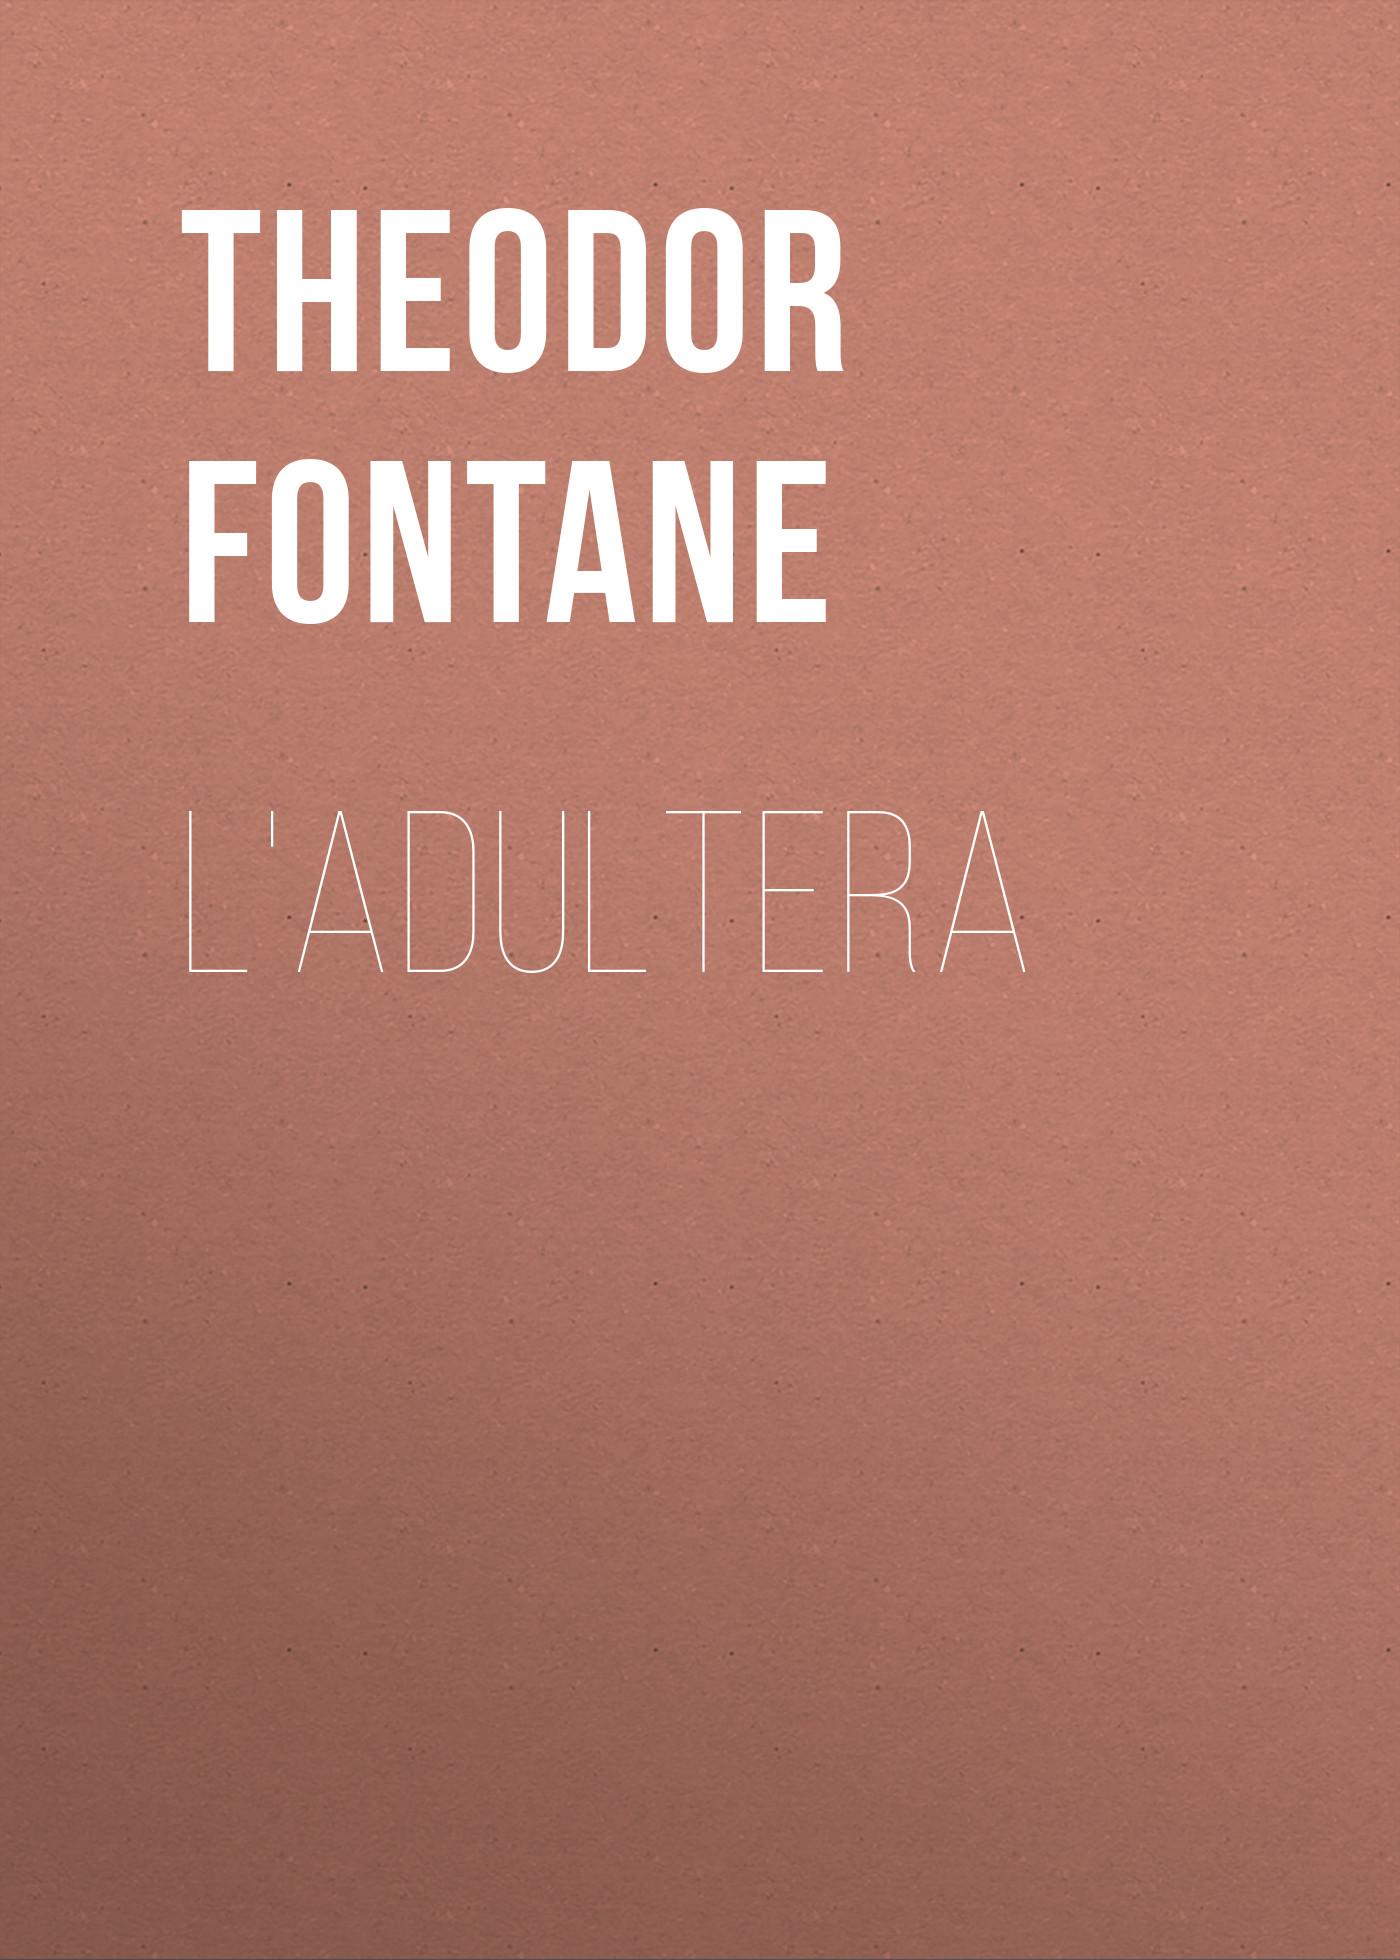 Theodor Fontane L'Adultera josef ettlinger theodor fontane biografie